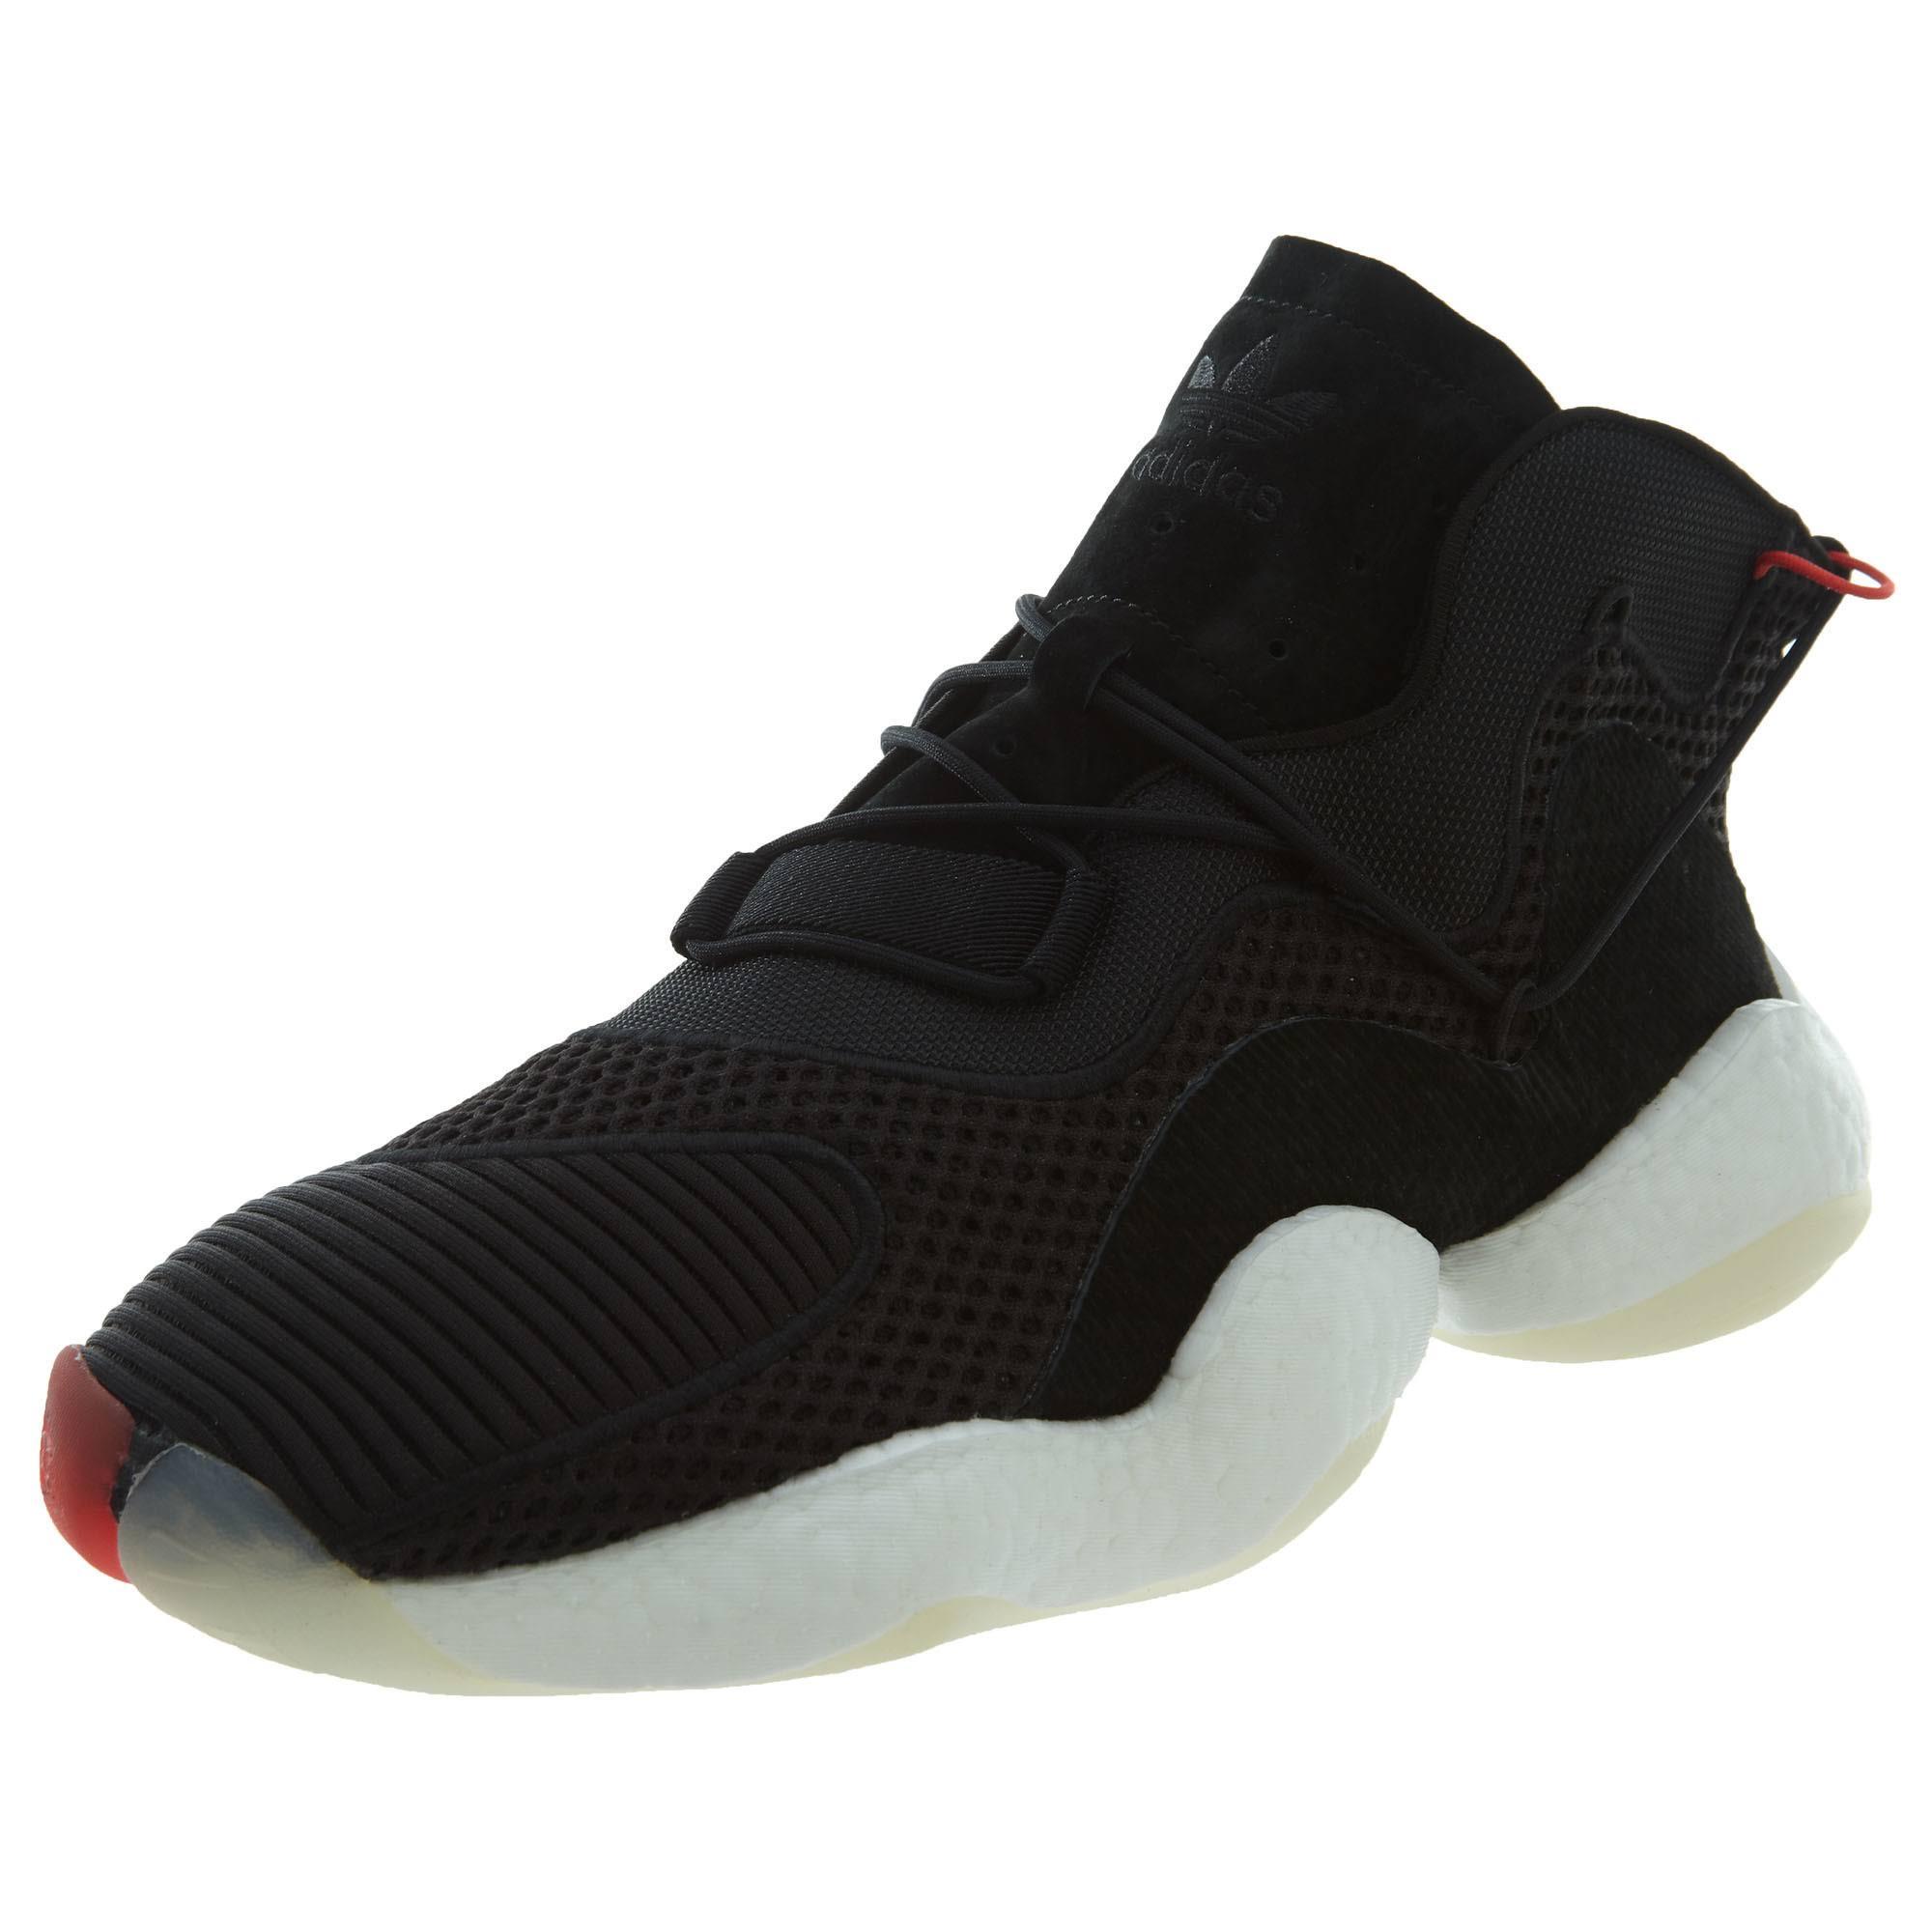 Crazy Wht Byw Mens Red Style Adidas blk Black B37480 FgqBKd1MA